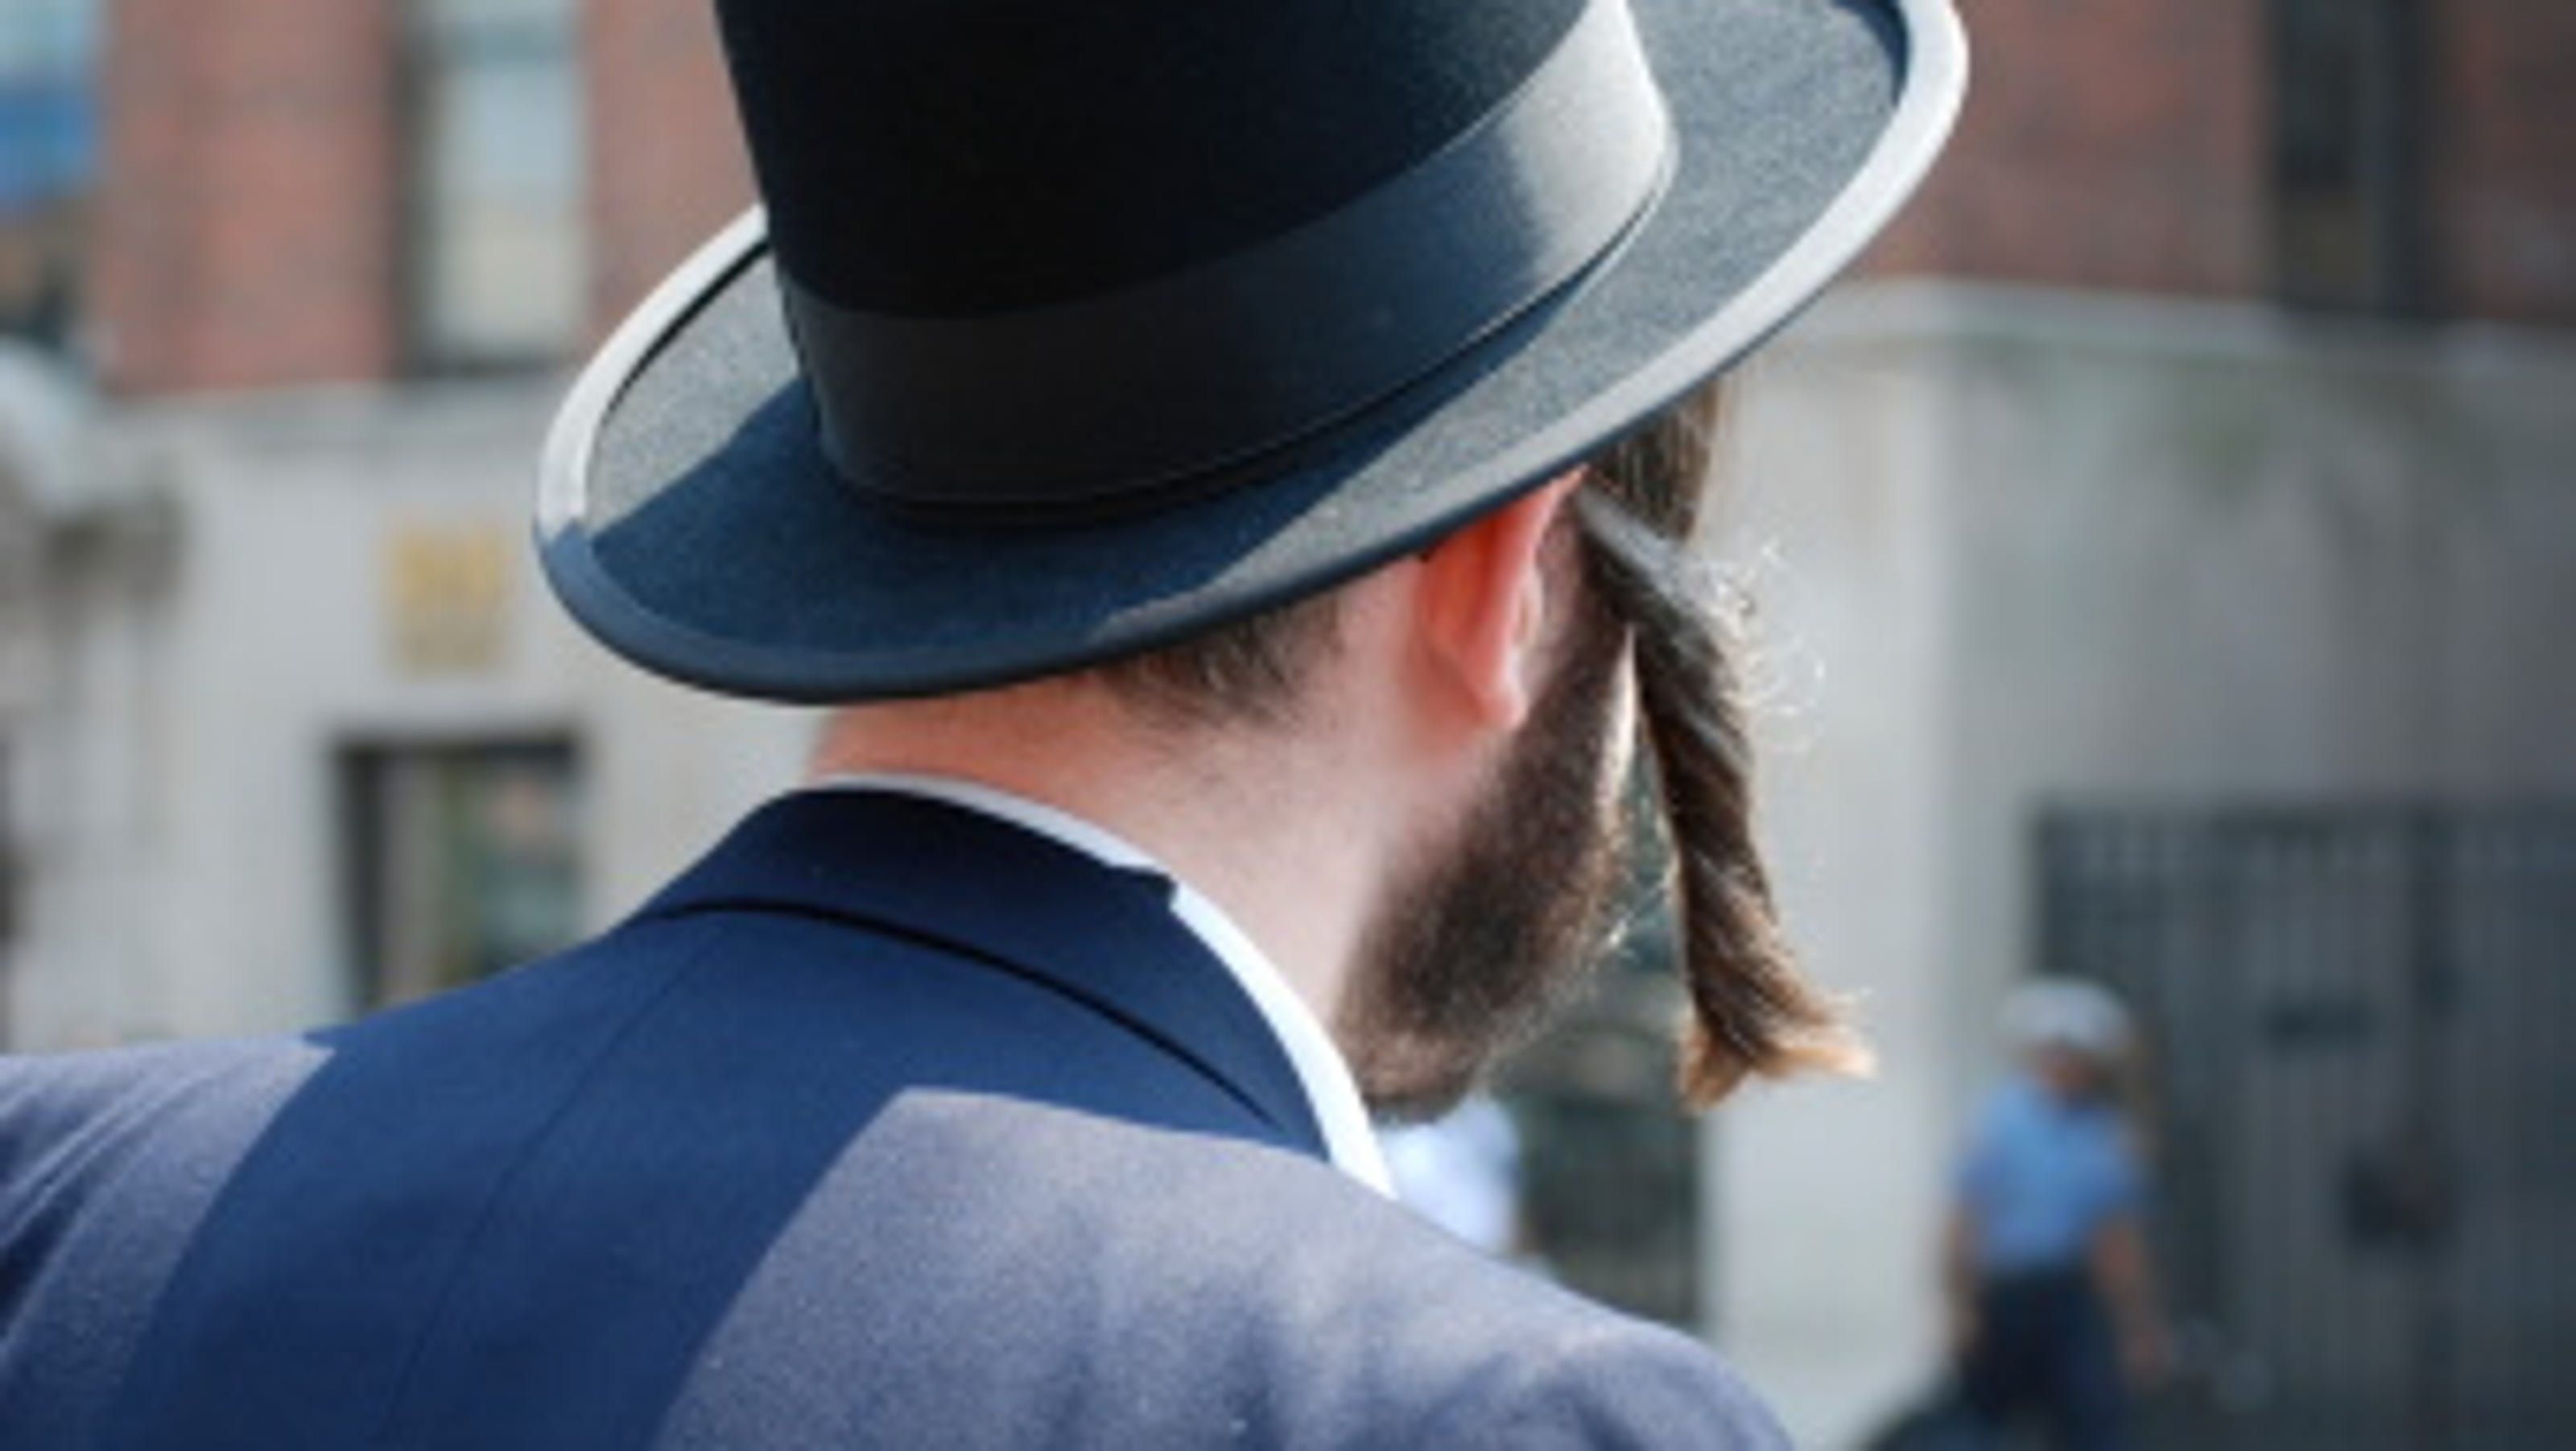 EDITORIAL: Clarify policy on aid to Orthodox - Asbury Park Press